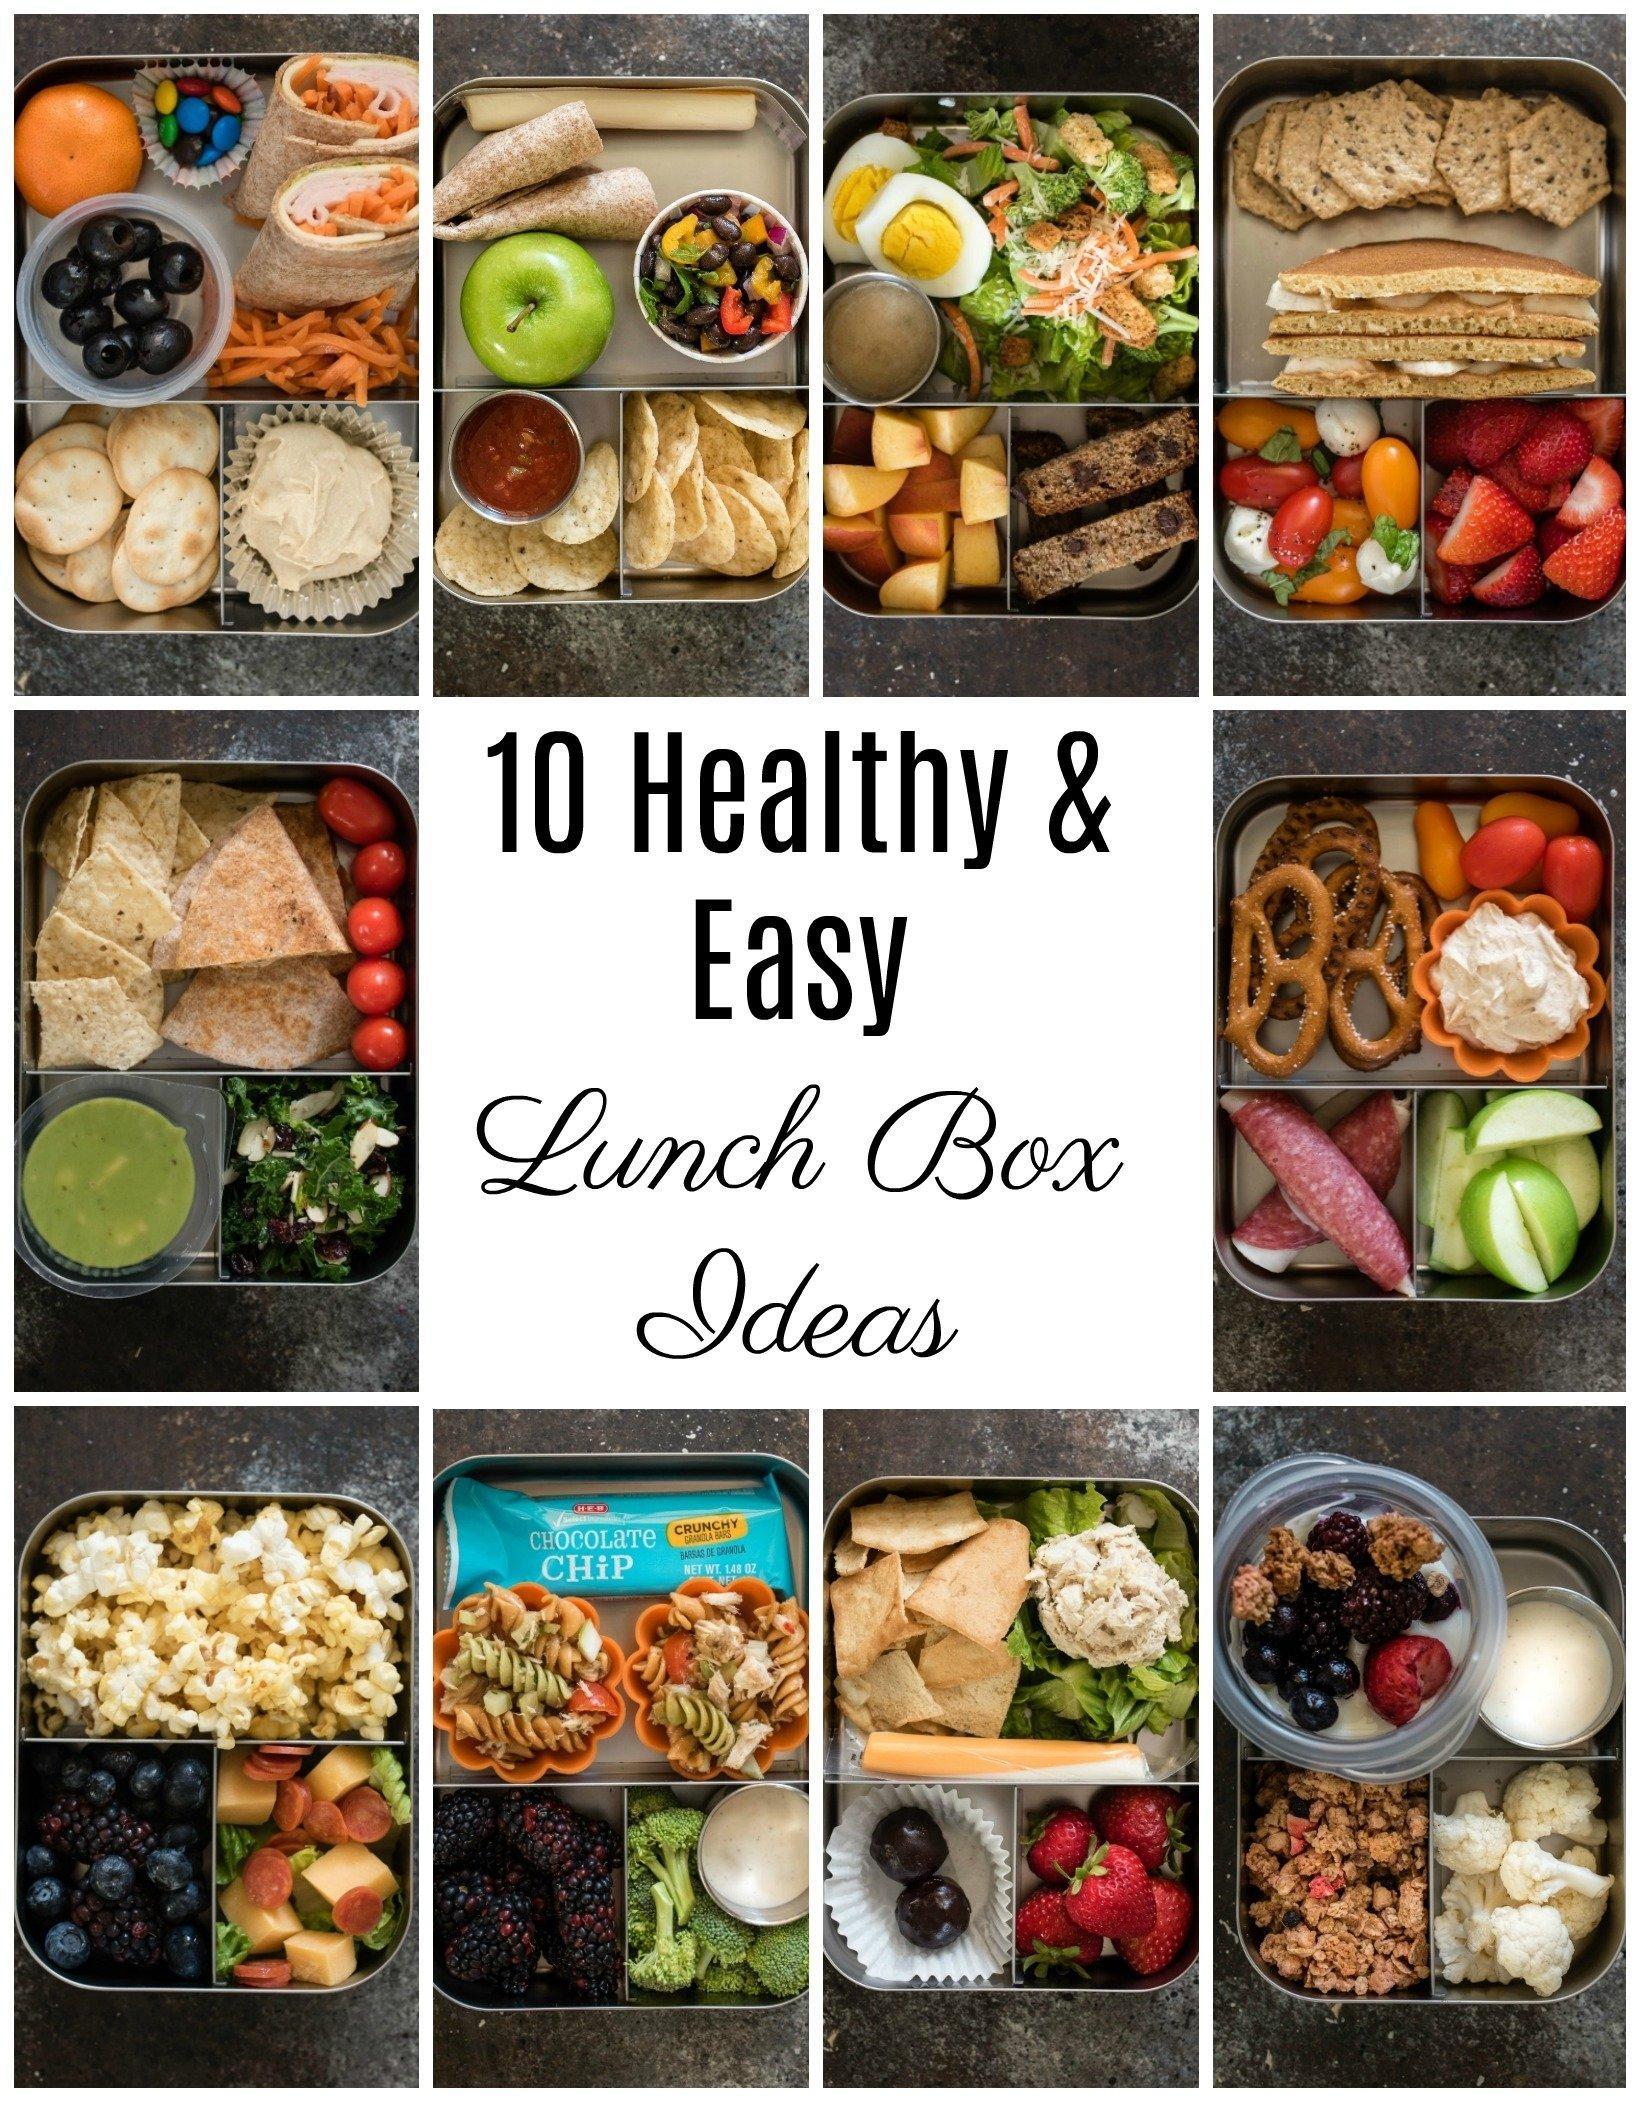 10 Fashionable Bento Box Ideas For Kids pancake pb banana sandwich and 10 healthy lunch box ideas 20 2020